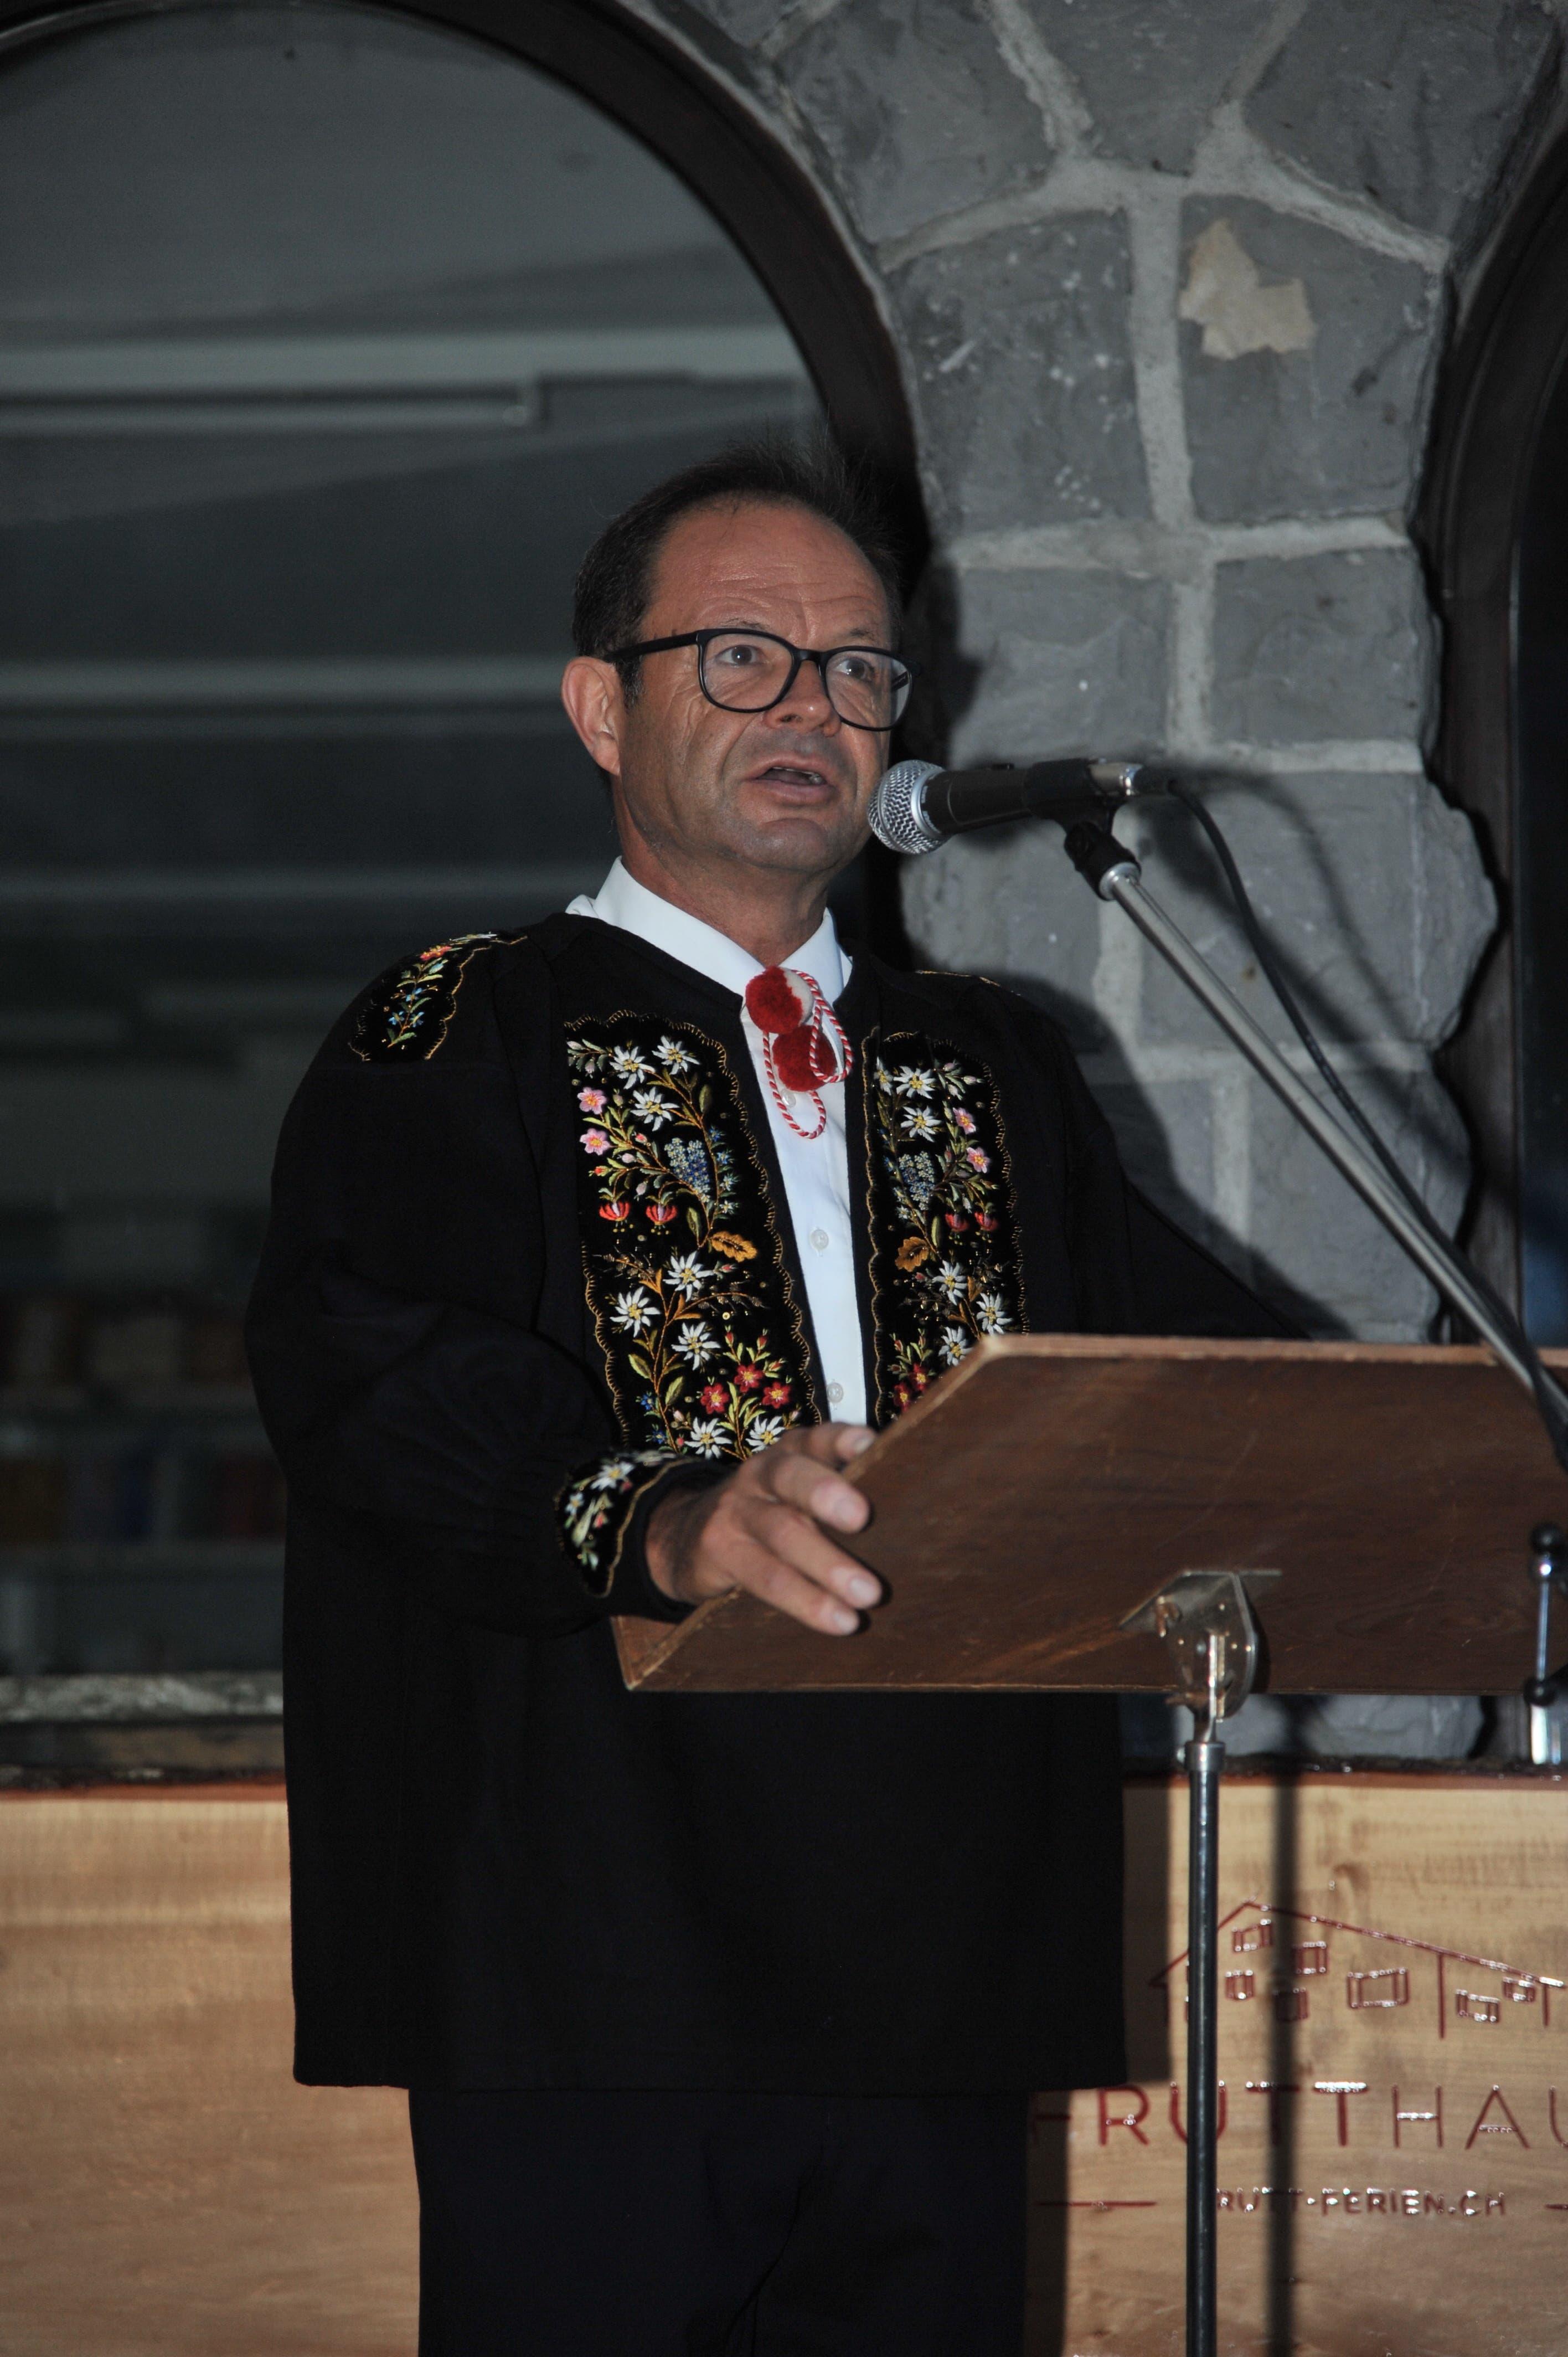 Regierungsrat Josef Hess hielt die Festrede an der 1.-August-Feier auf der Frutt.